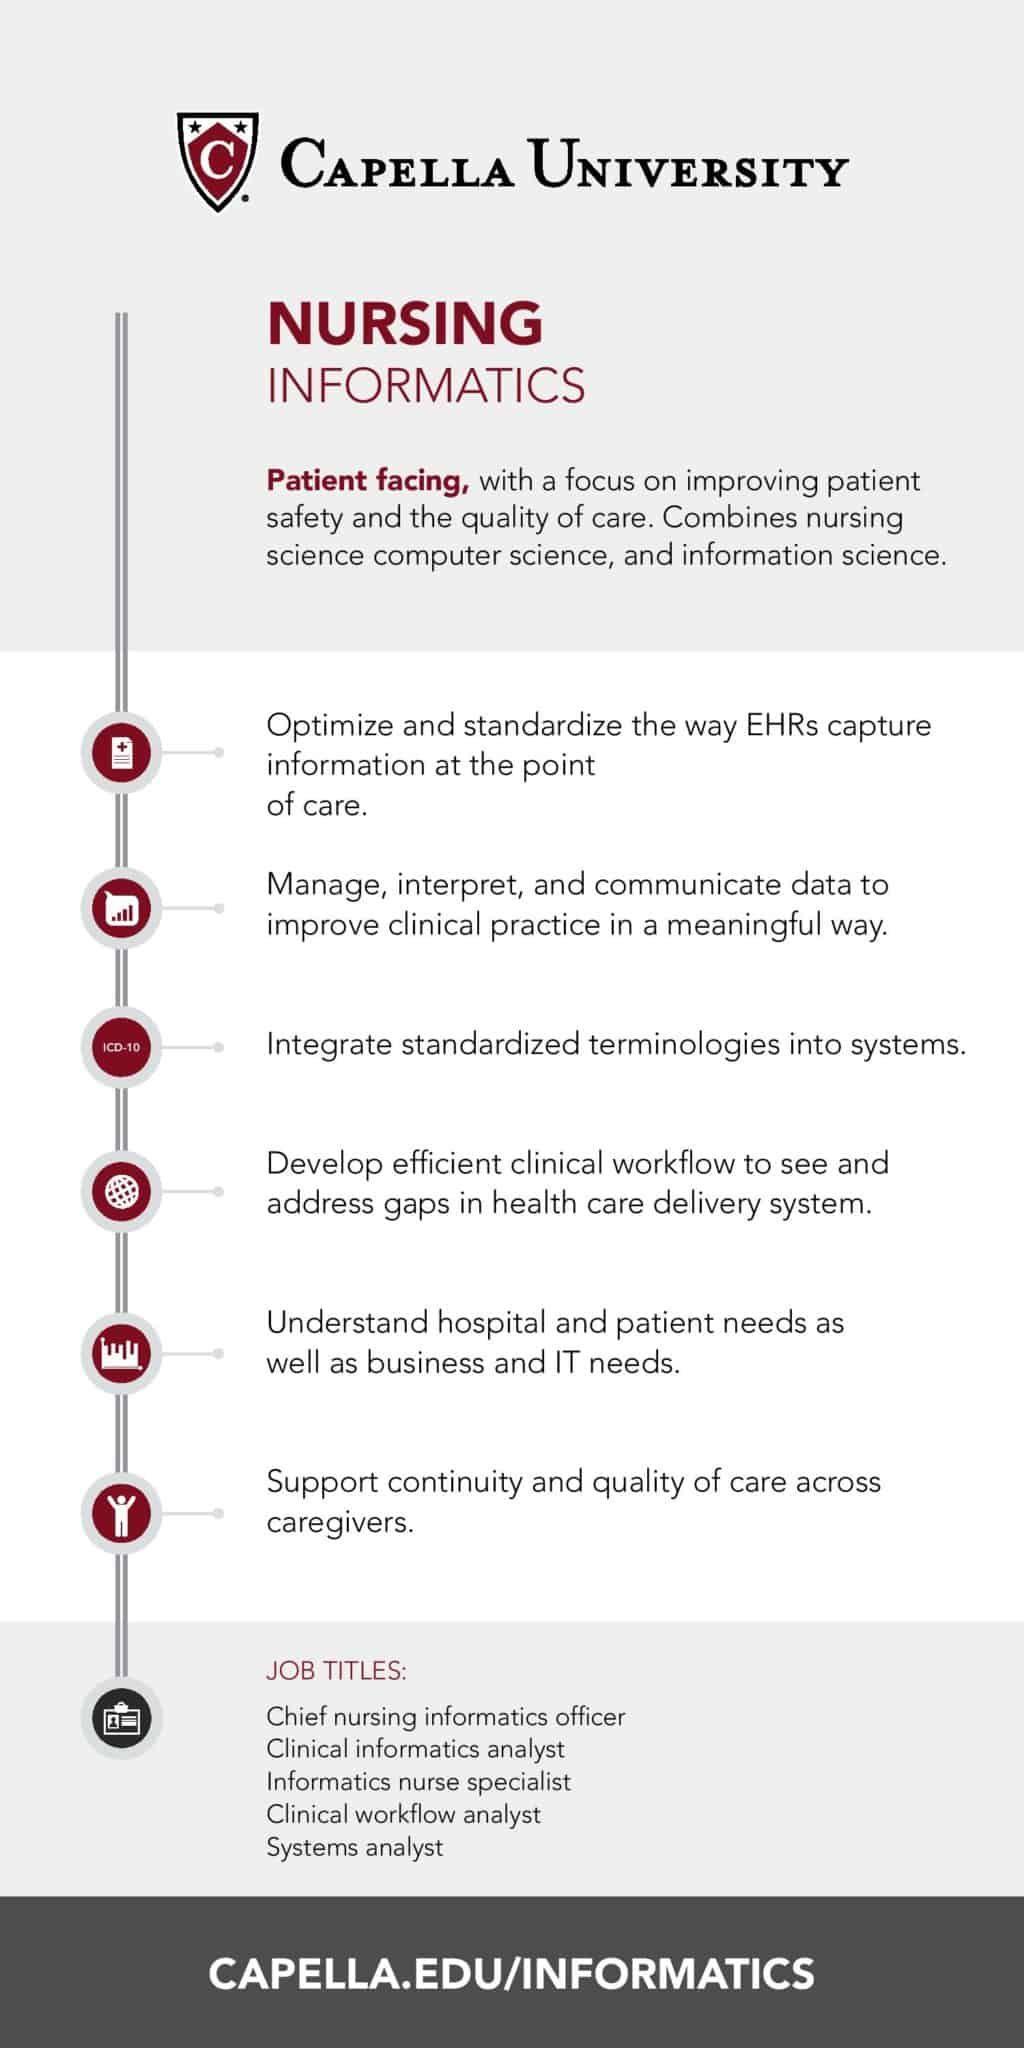 Nursing Informatics Jobs Have you considered a Career